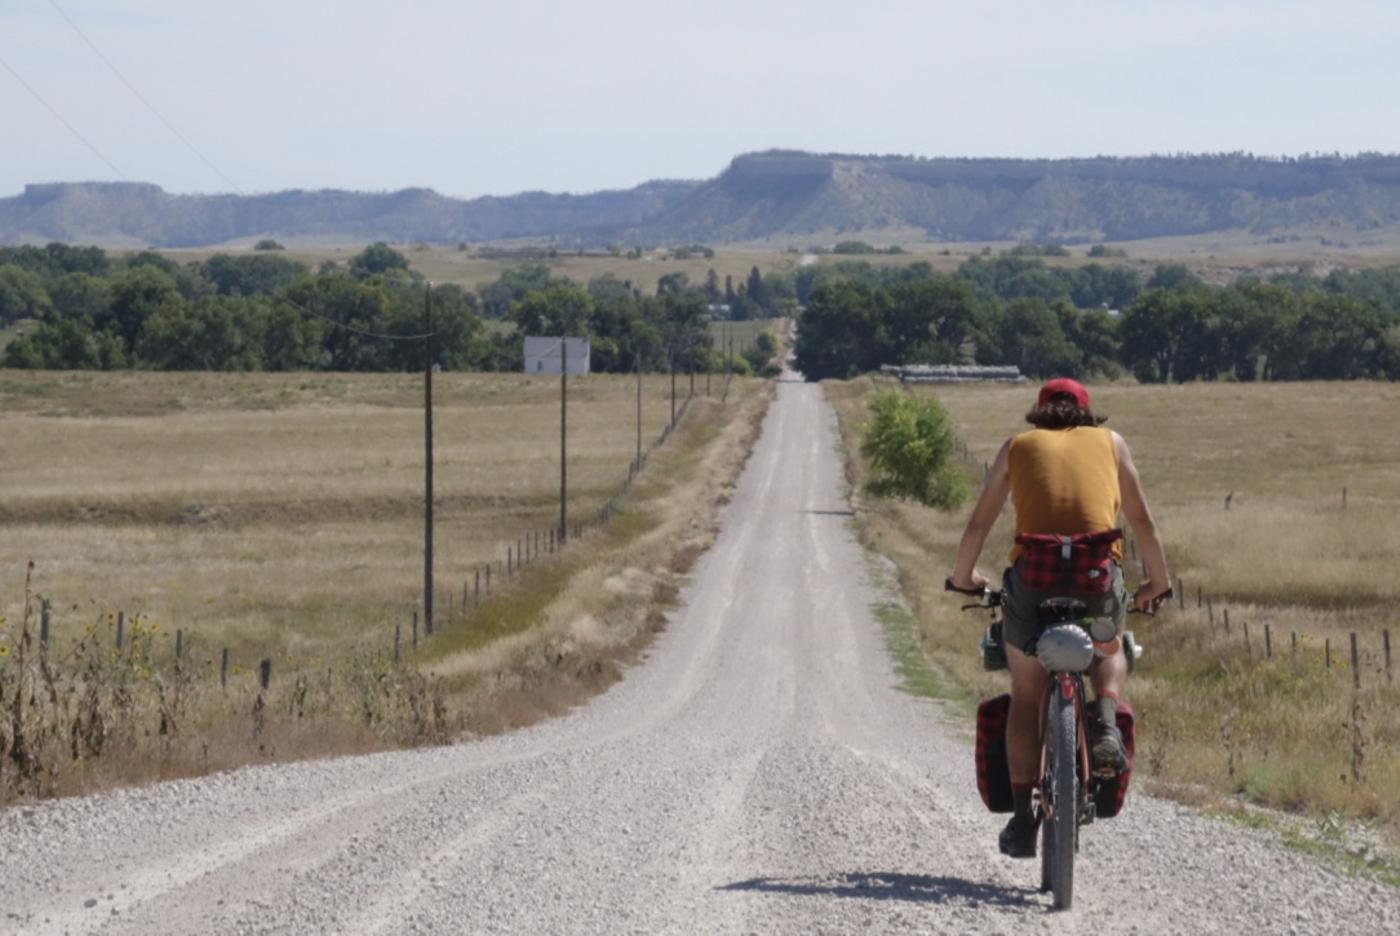 Where Nebraska Ends: The Champion and the Corner